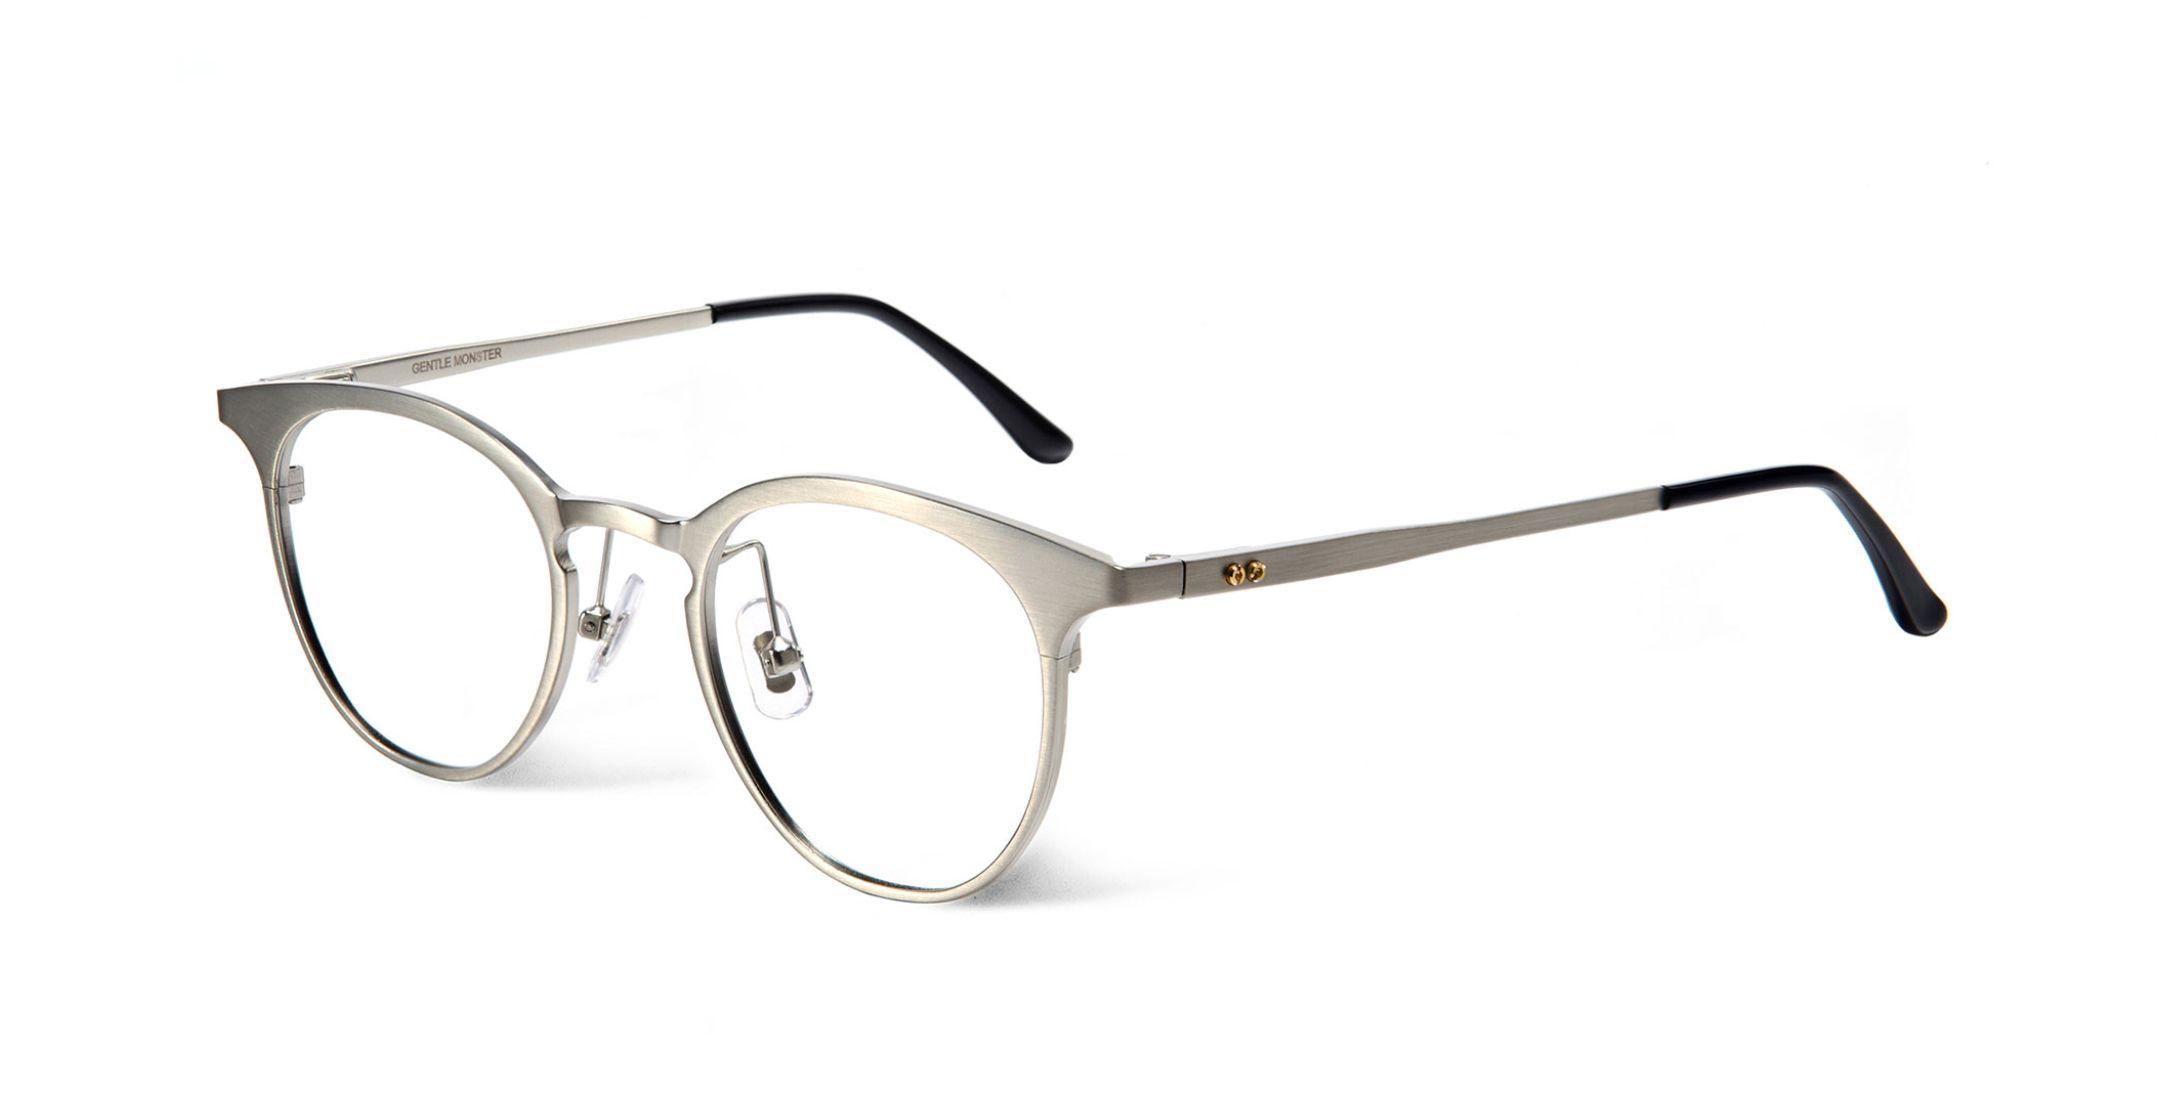 68beffca0bb GENTLE MONSTER - pluto 02 Latest Sunglasses